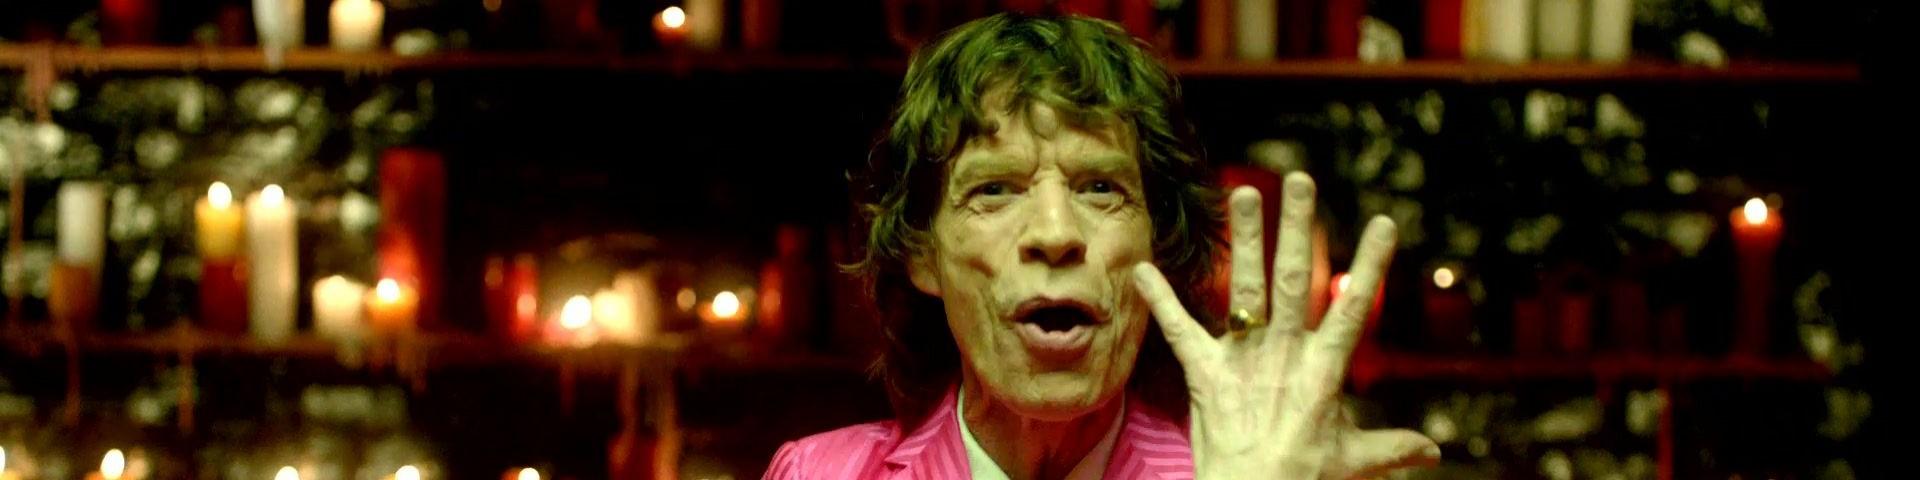 Storie di band parallele: Mick Jagger e Billie Joe Armstrong